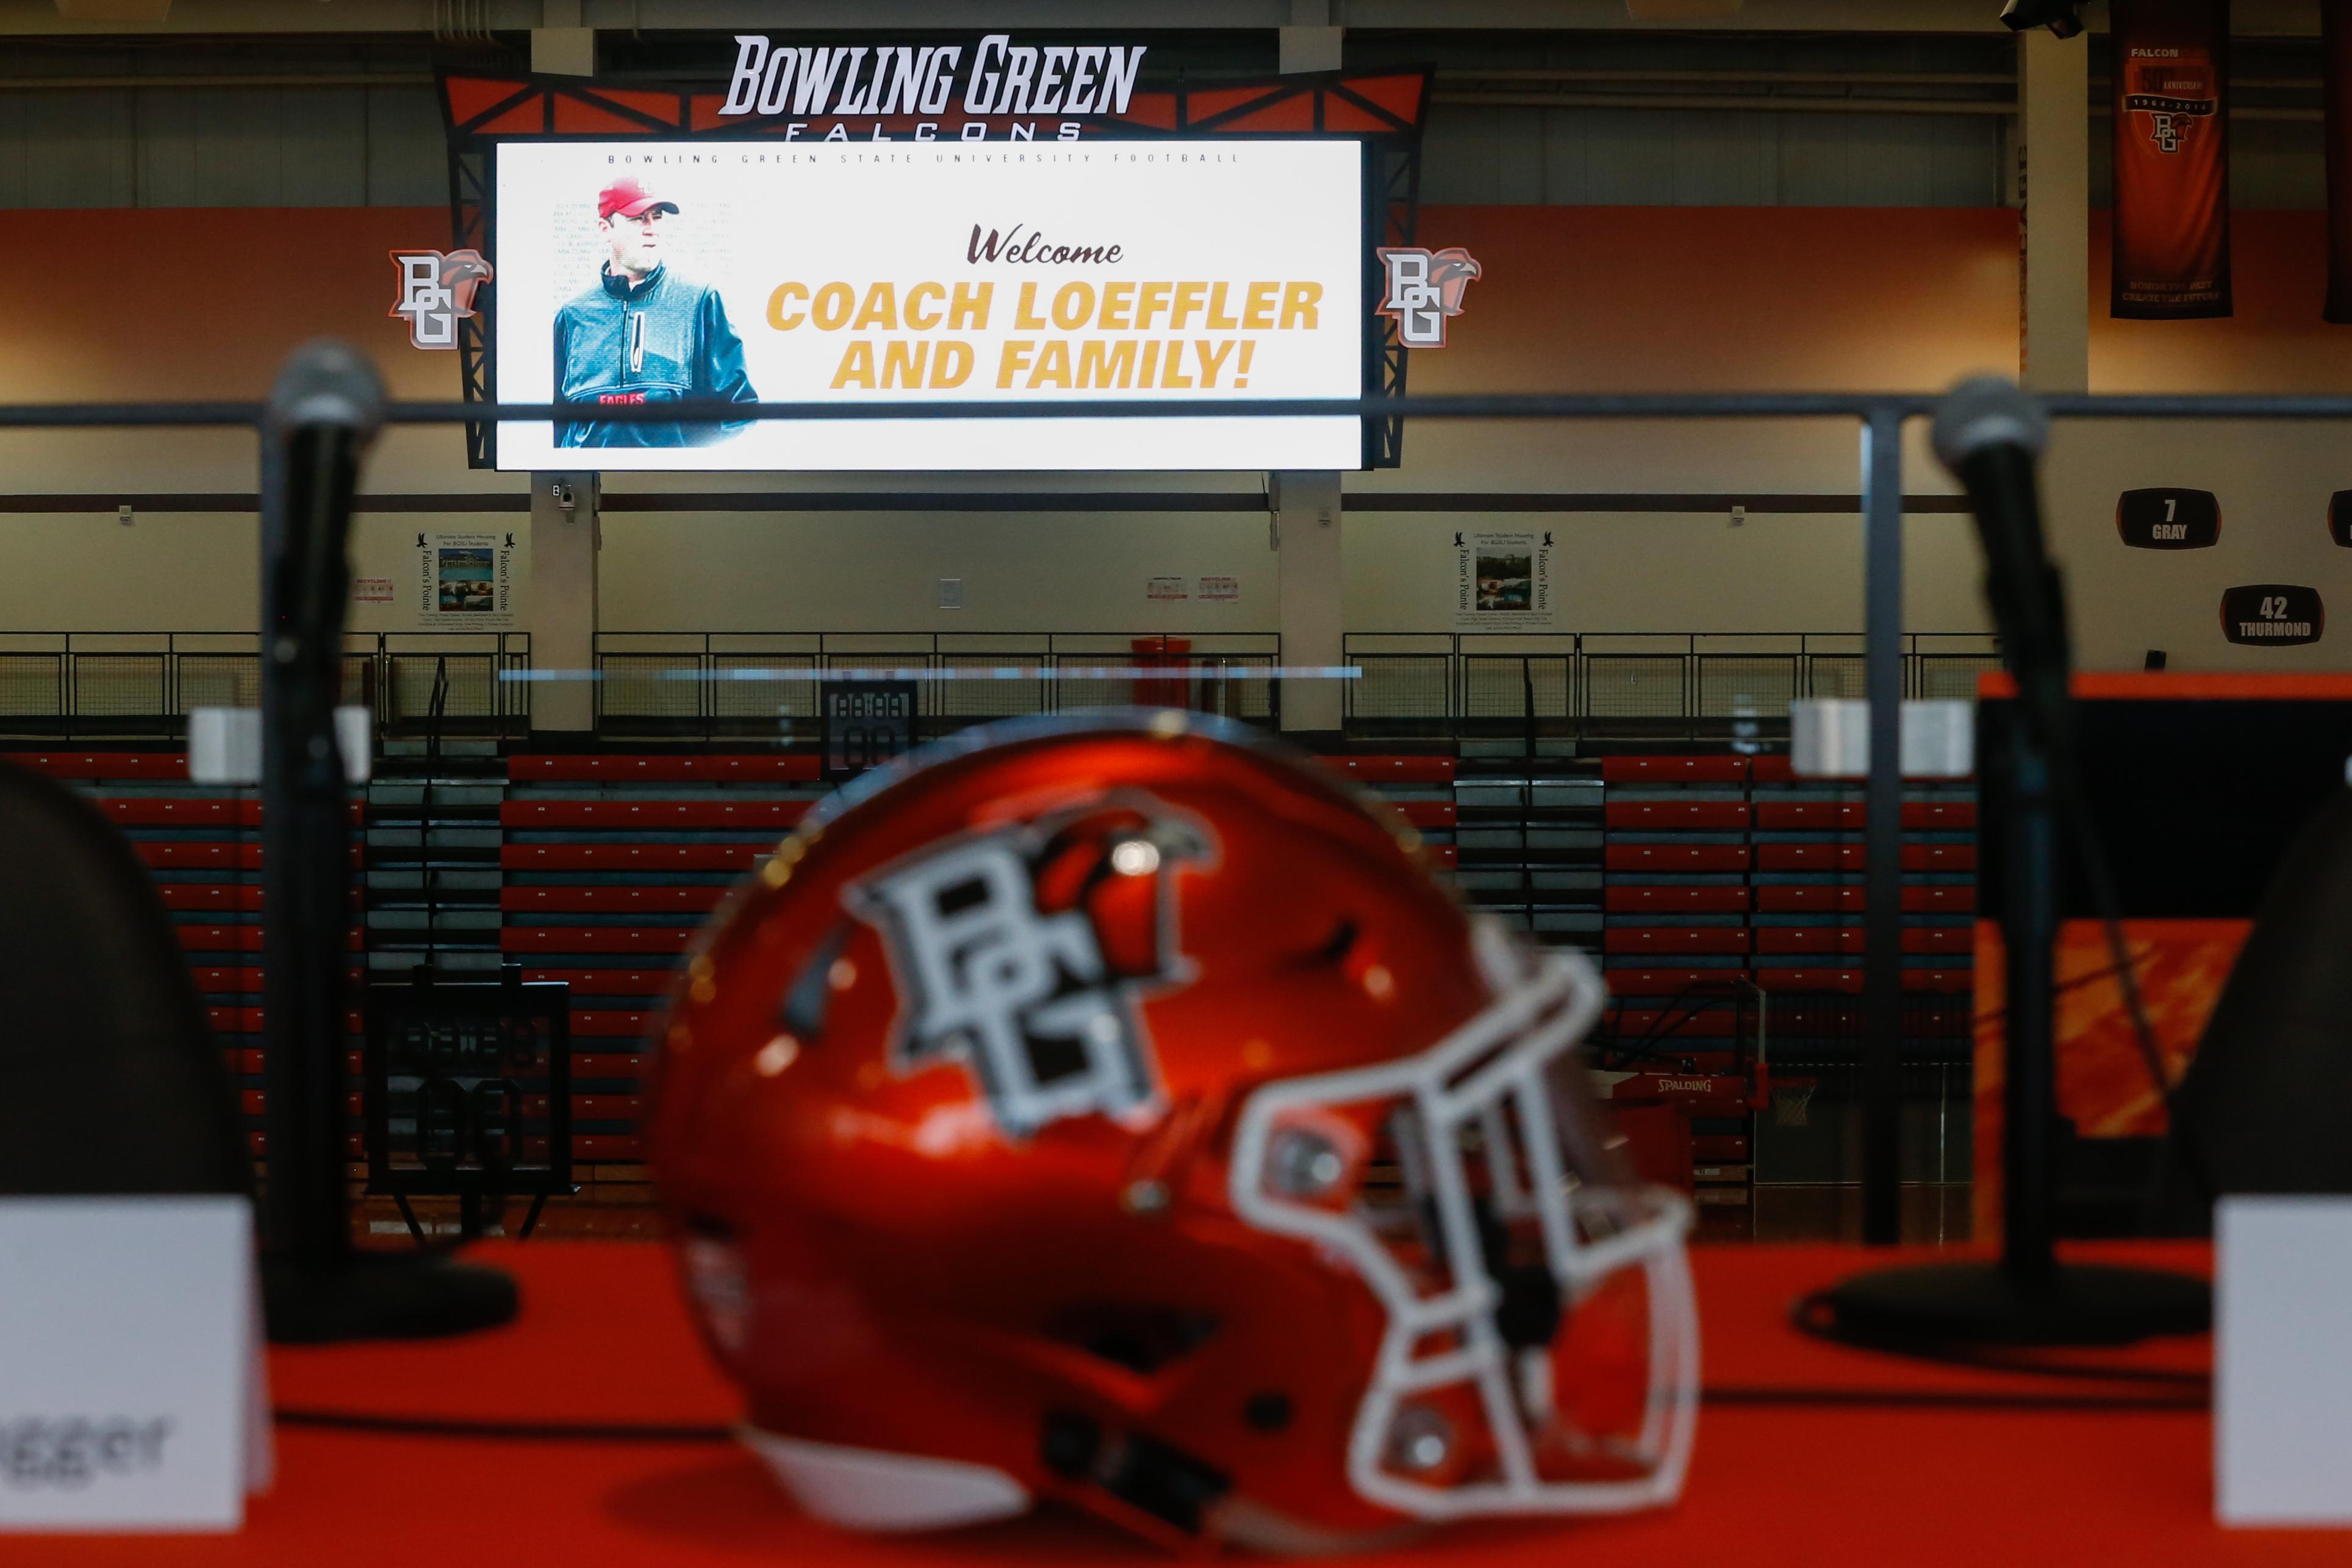 COLLEGE FOOTBALL: NOV 29 Bowling Green Introduces Scot Loeffler as New Head Coach